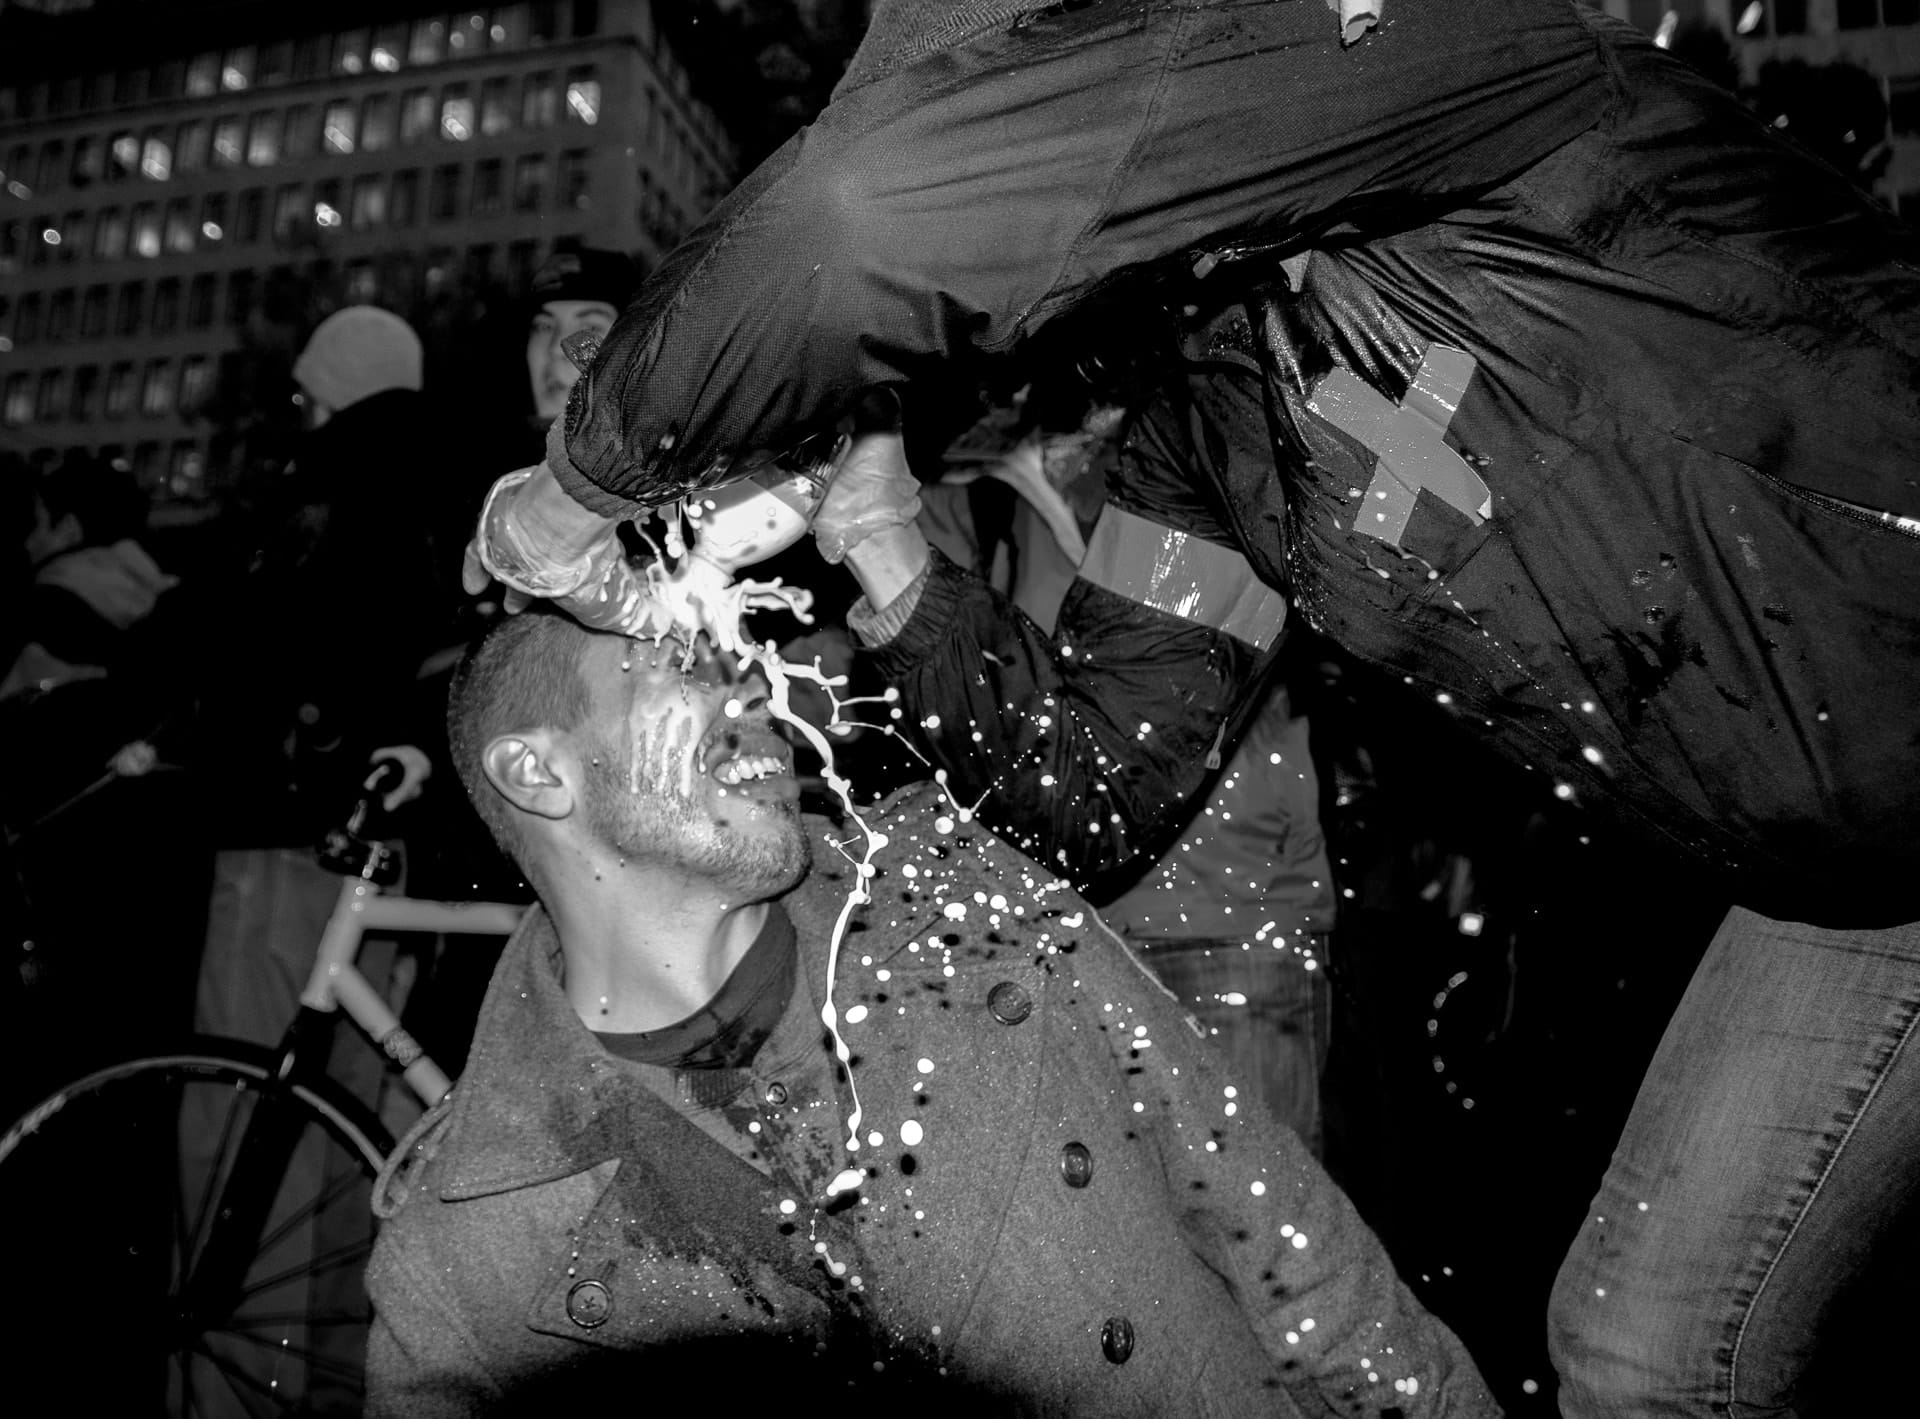 """Flash Street Photography"" Street Photograph by Tzen Xing"